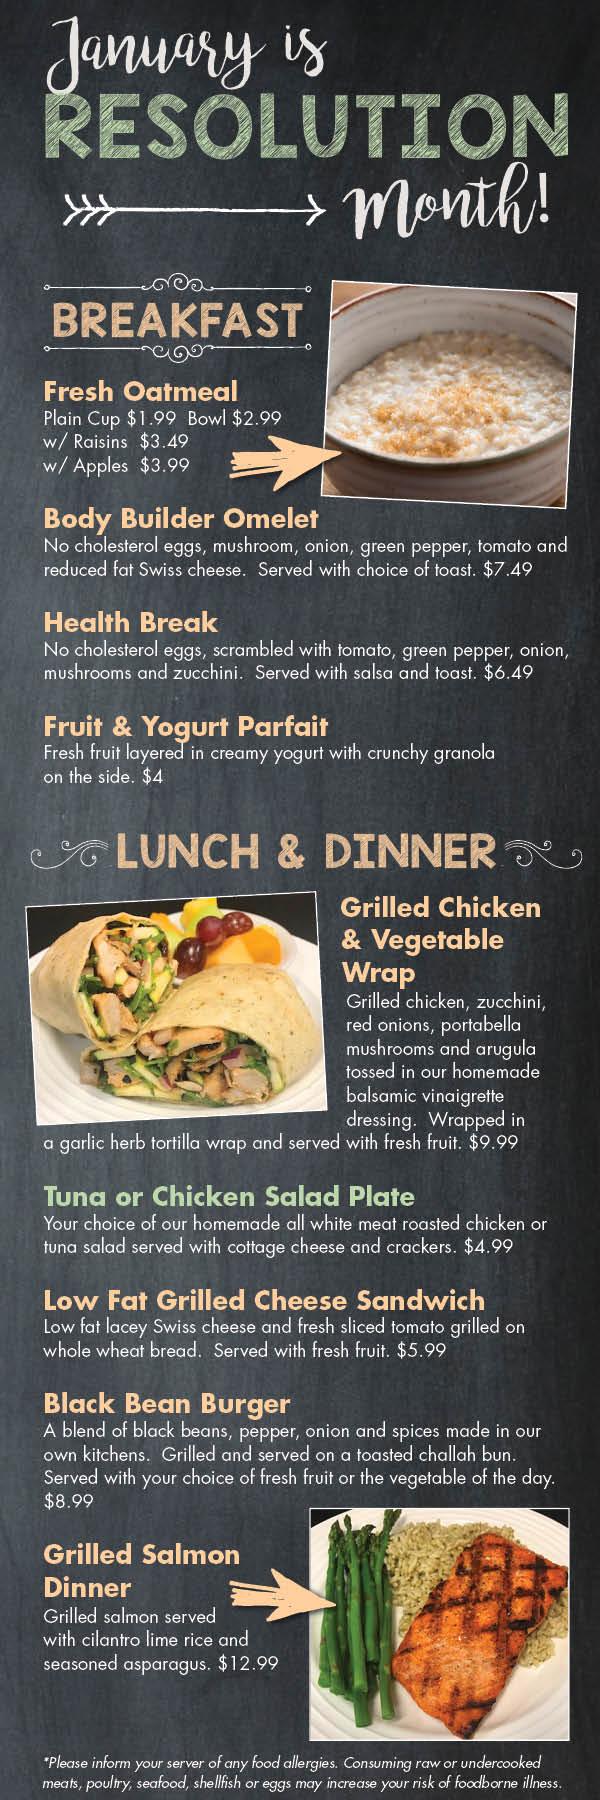 January Restaurant Specials